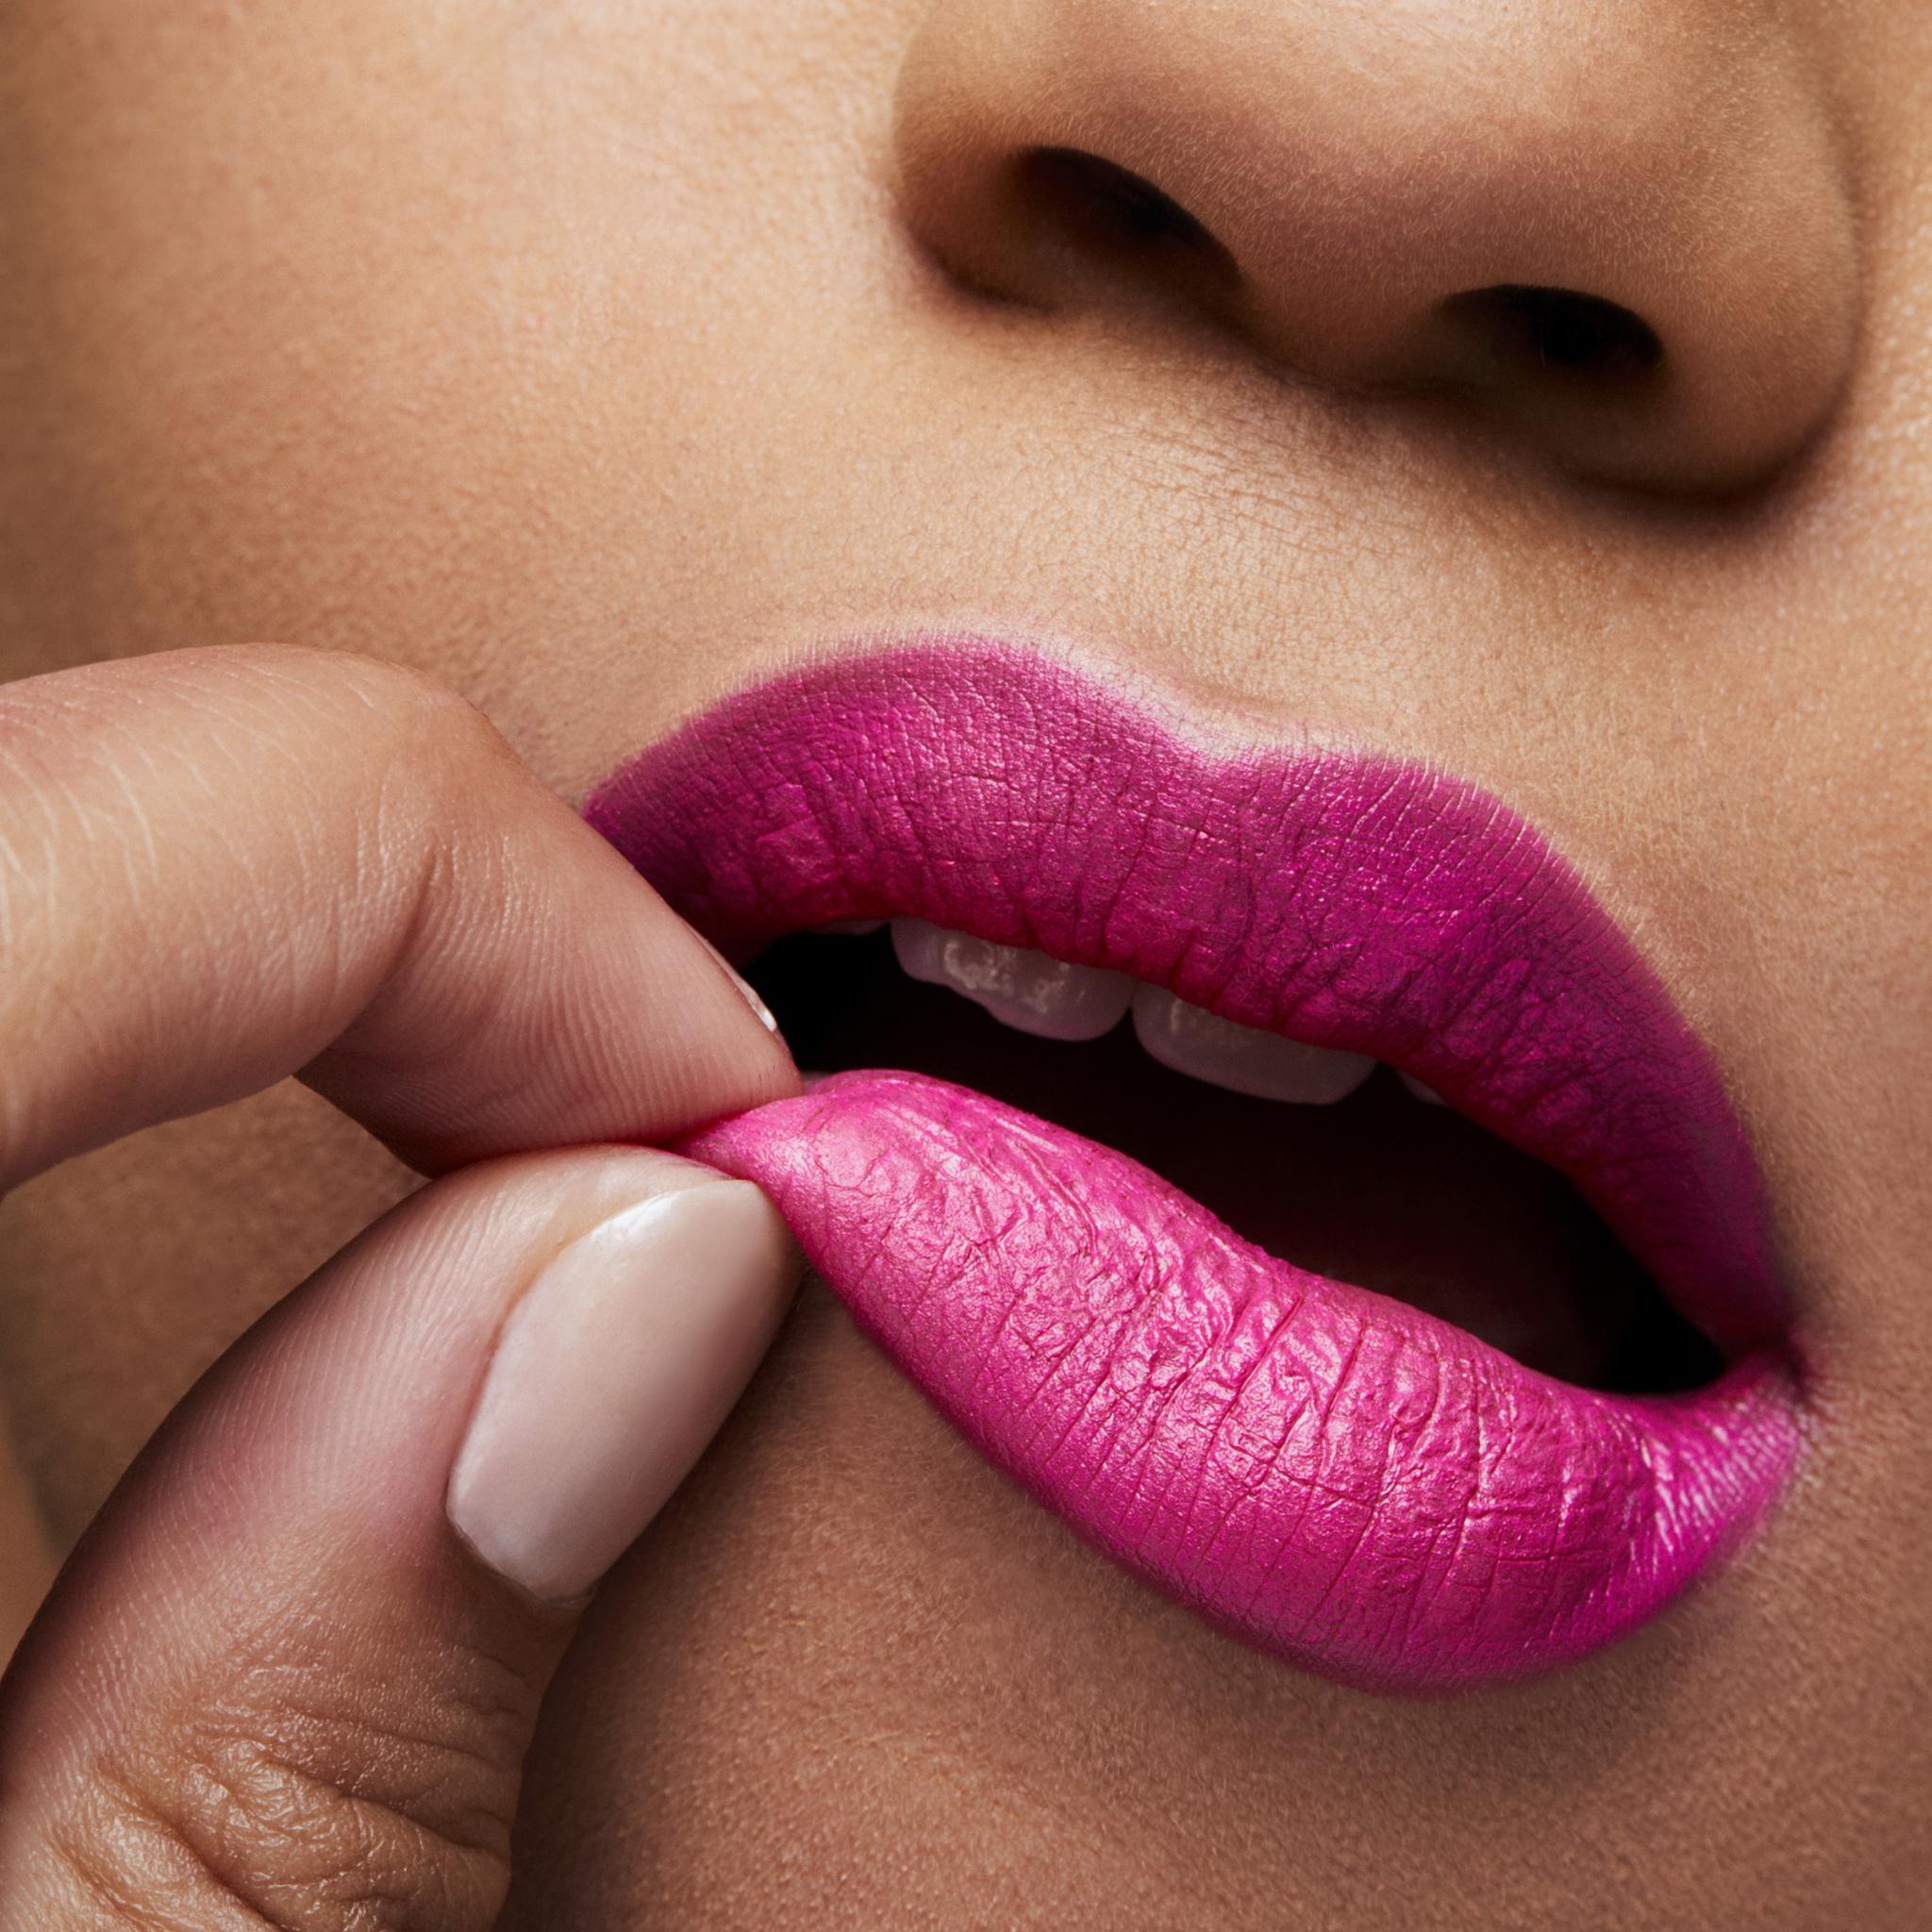 MAC Lipstick, got you talking